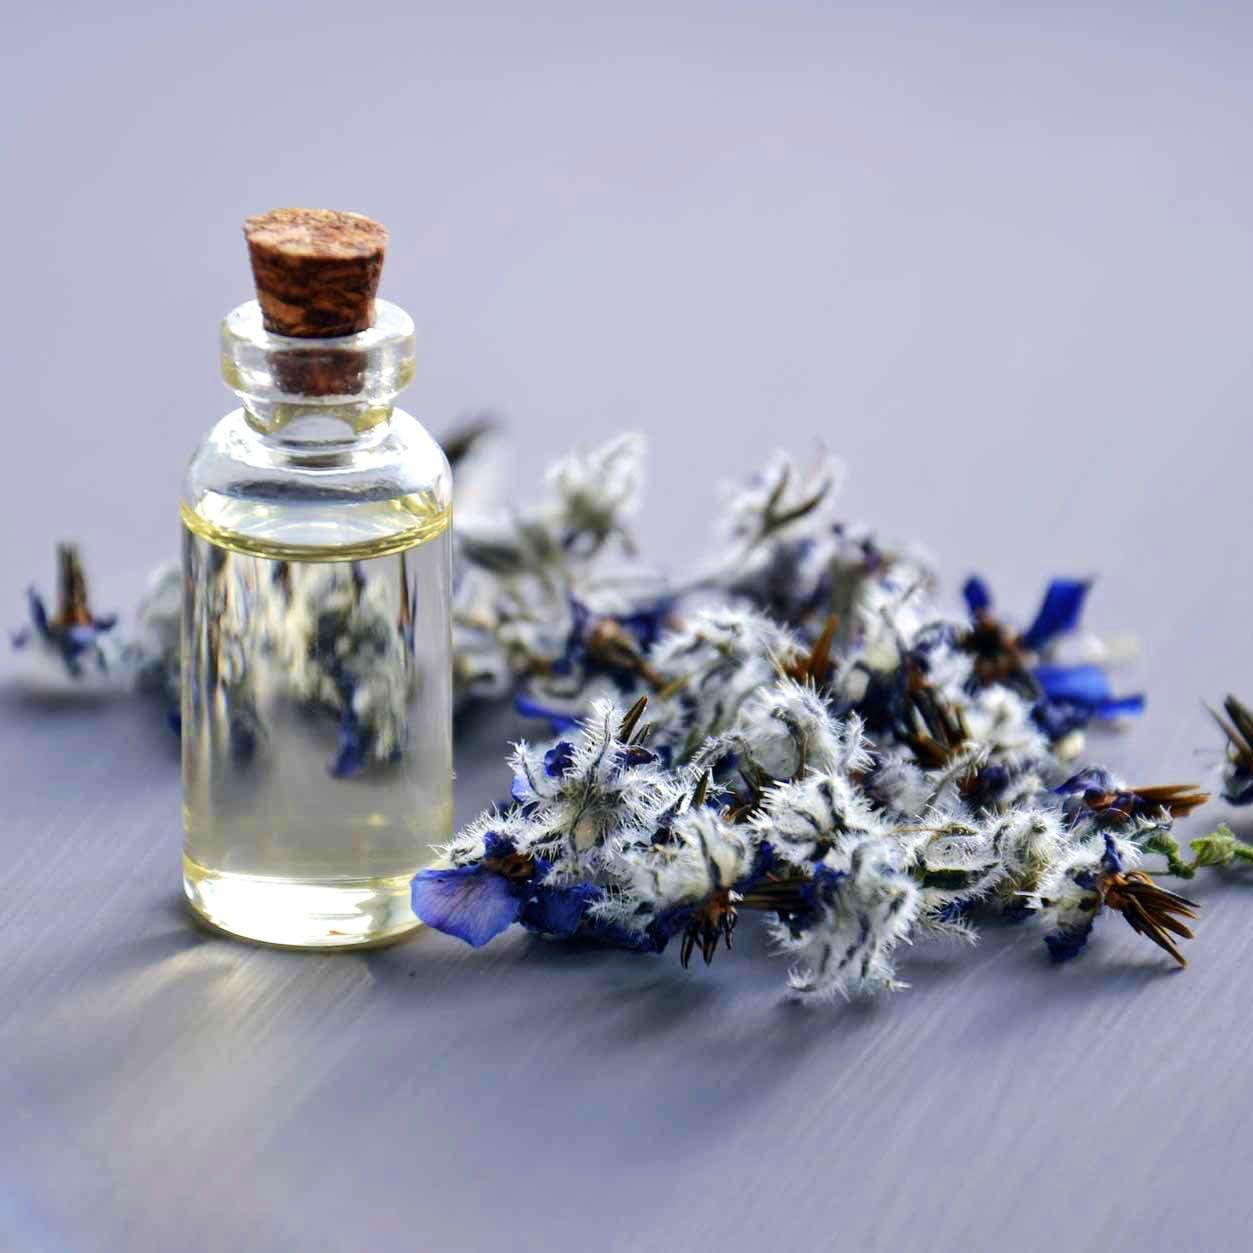 image - RK Perfumes